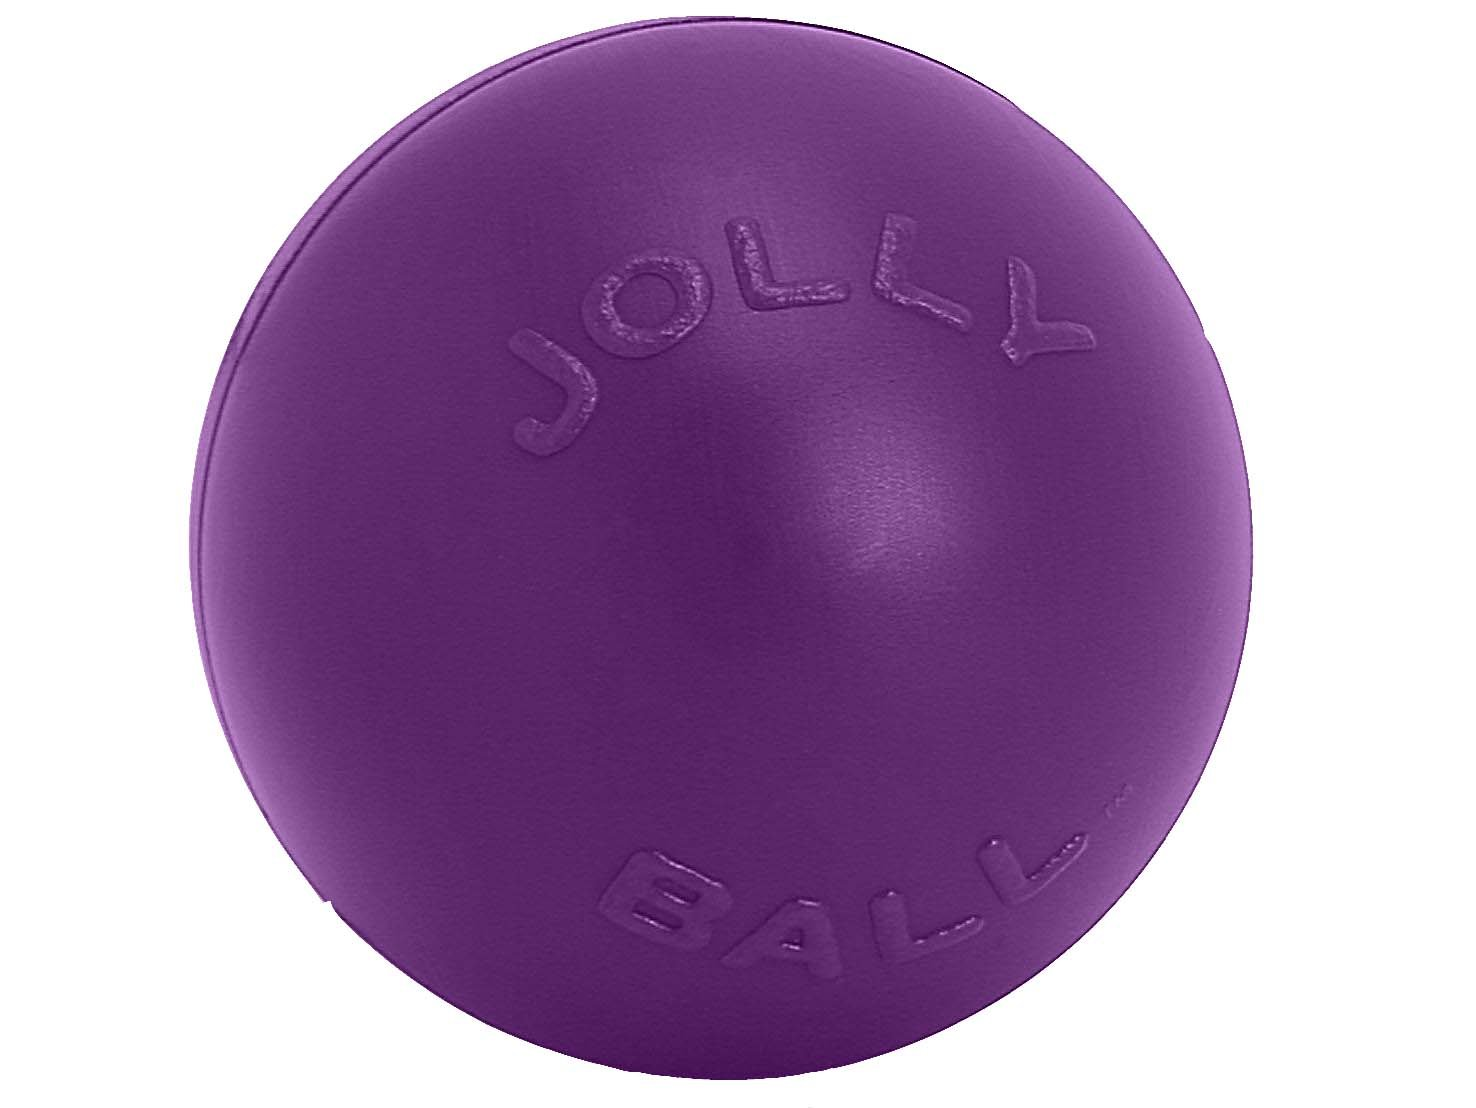 Jolly Pets 3-Inch Push-n-Play, Purple